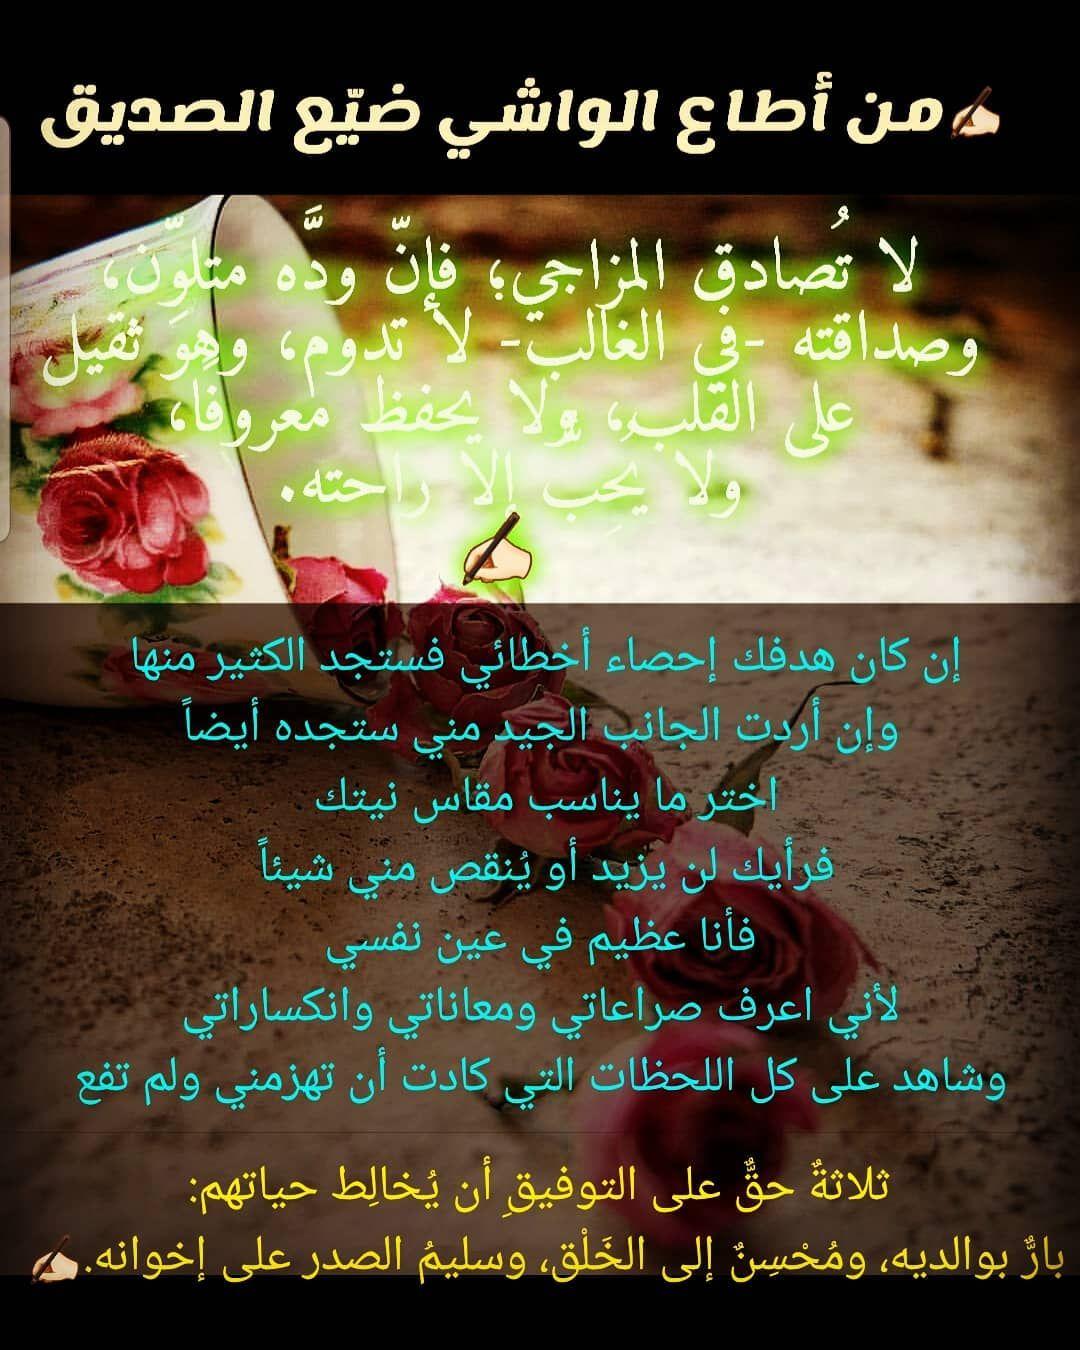 Pin By Rehab Elhassan On مواعظ Instagram Posts Instagram Movie Posters